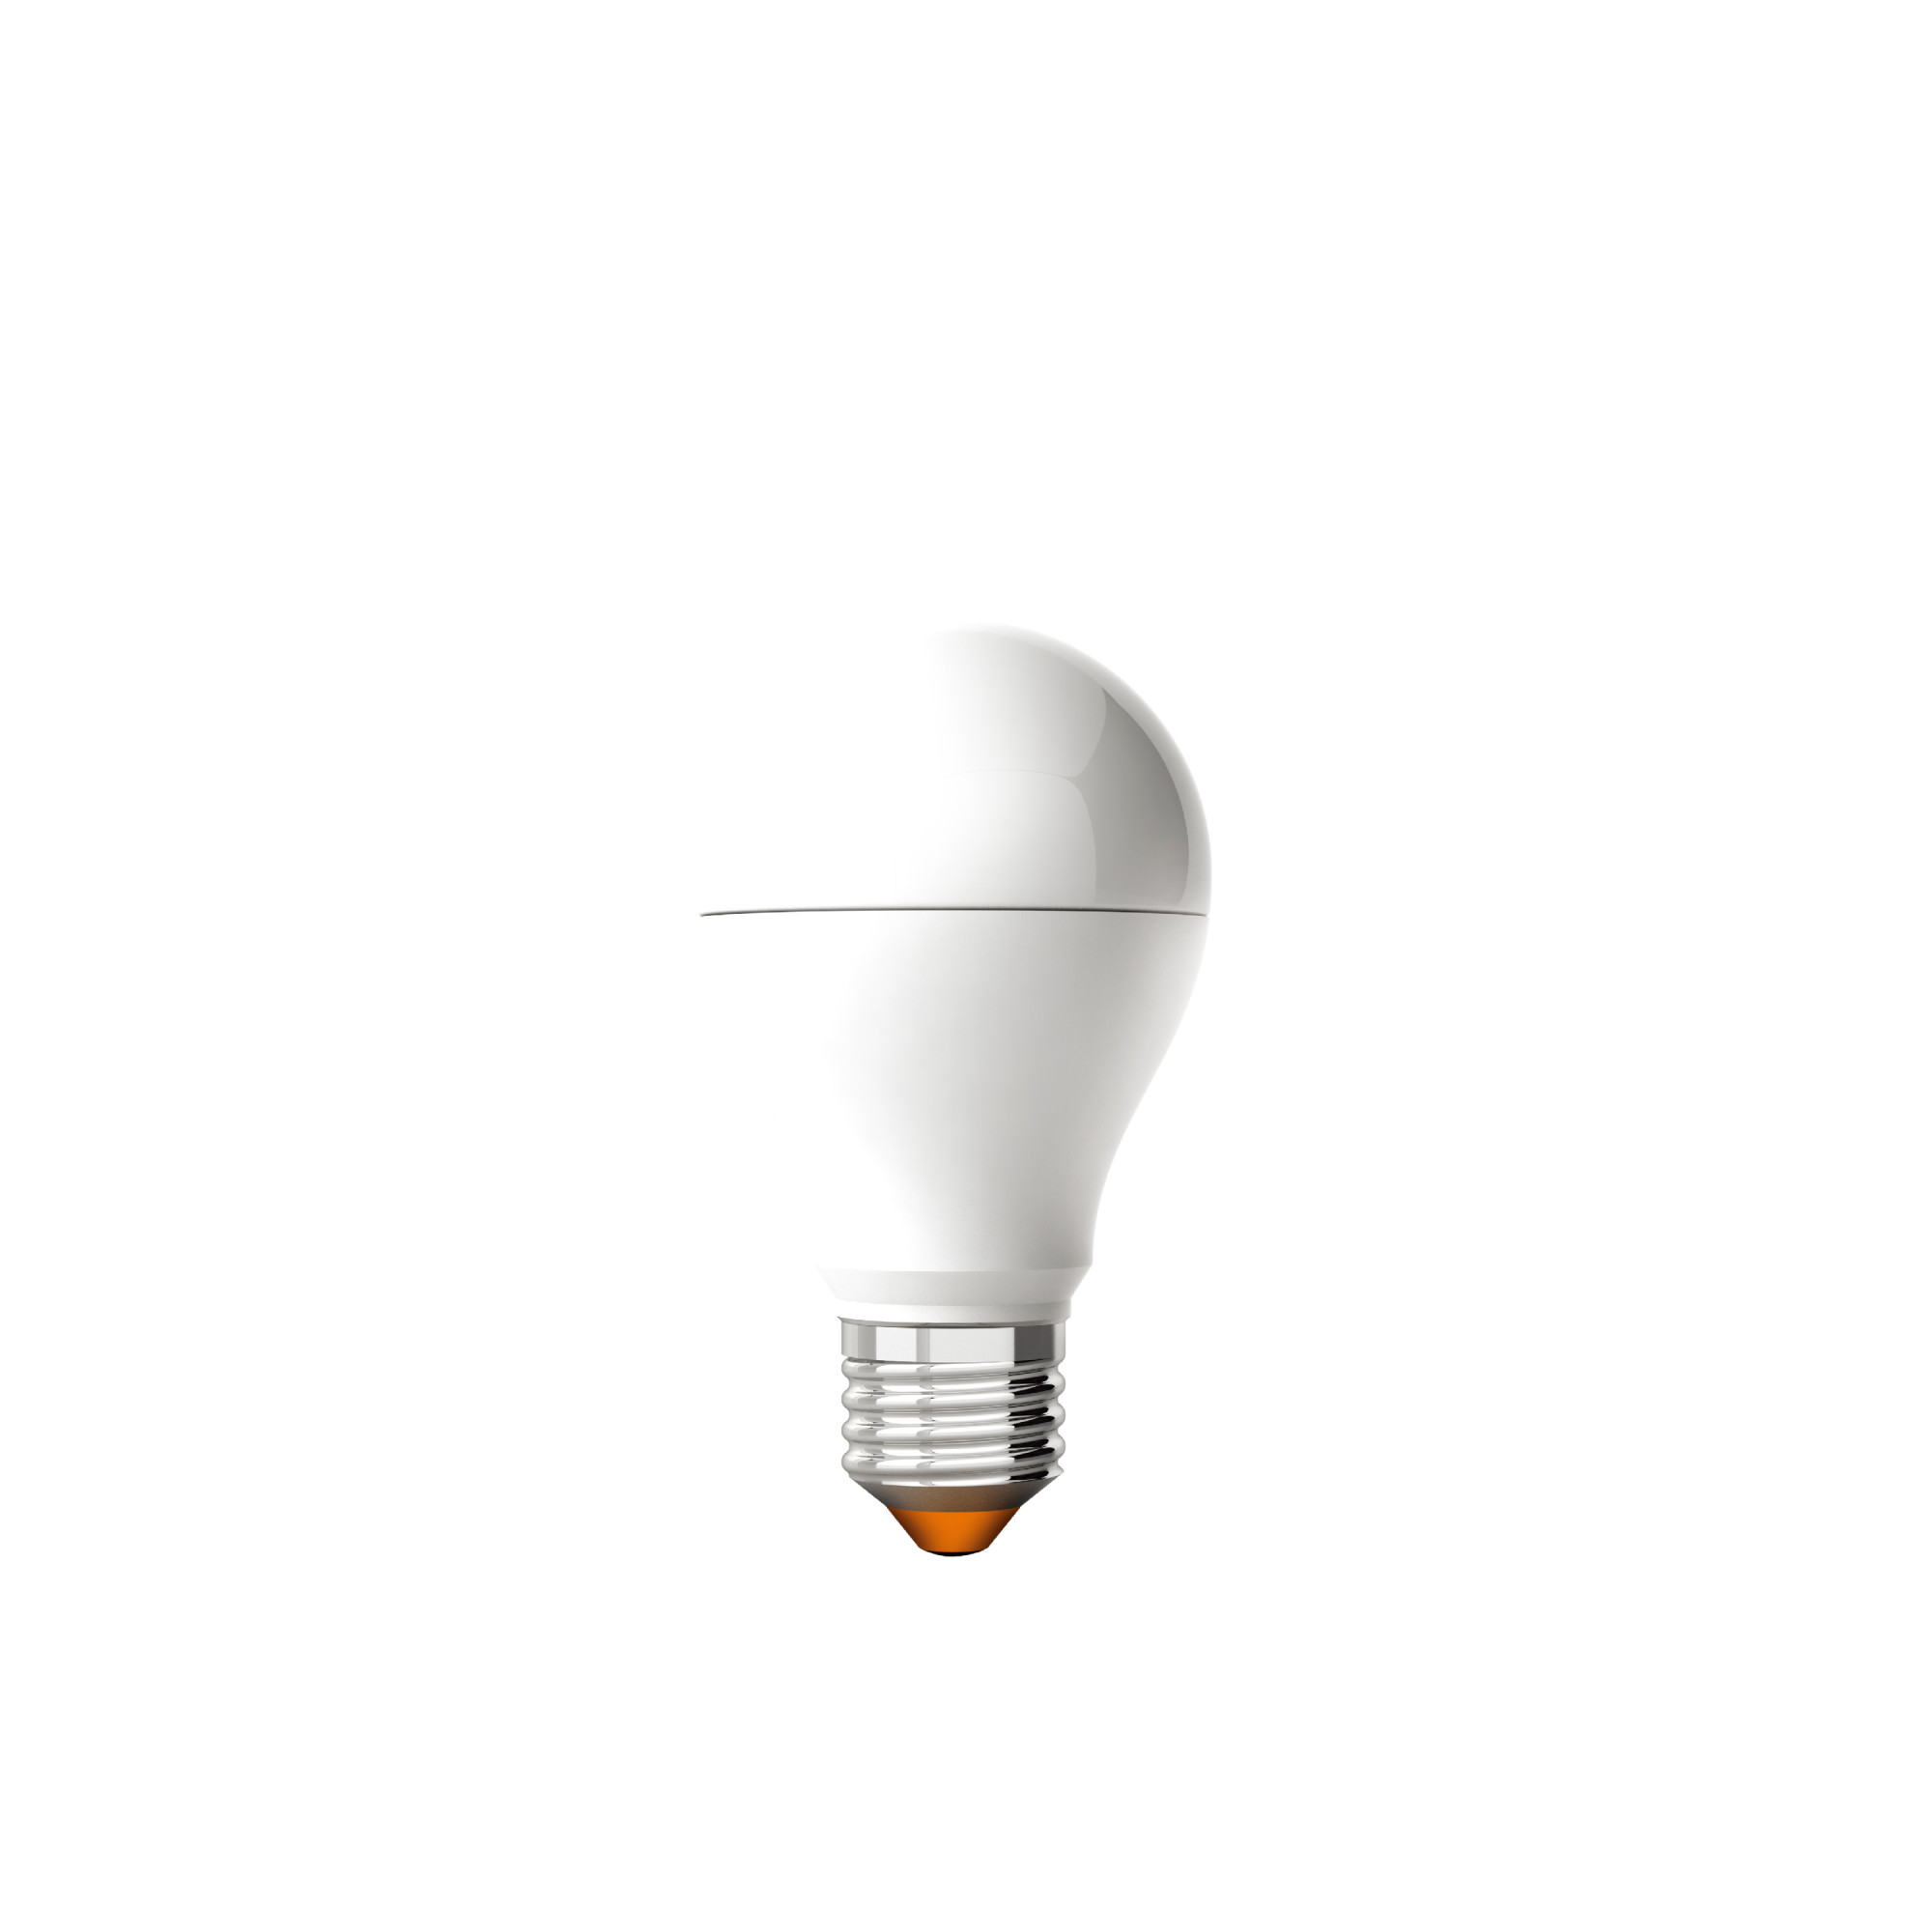 Лампа светодиодная Lexman «iDual One» E27 9.5 Вт 806 Лм RGBW